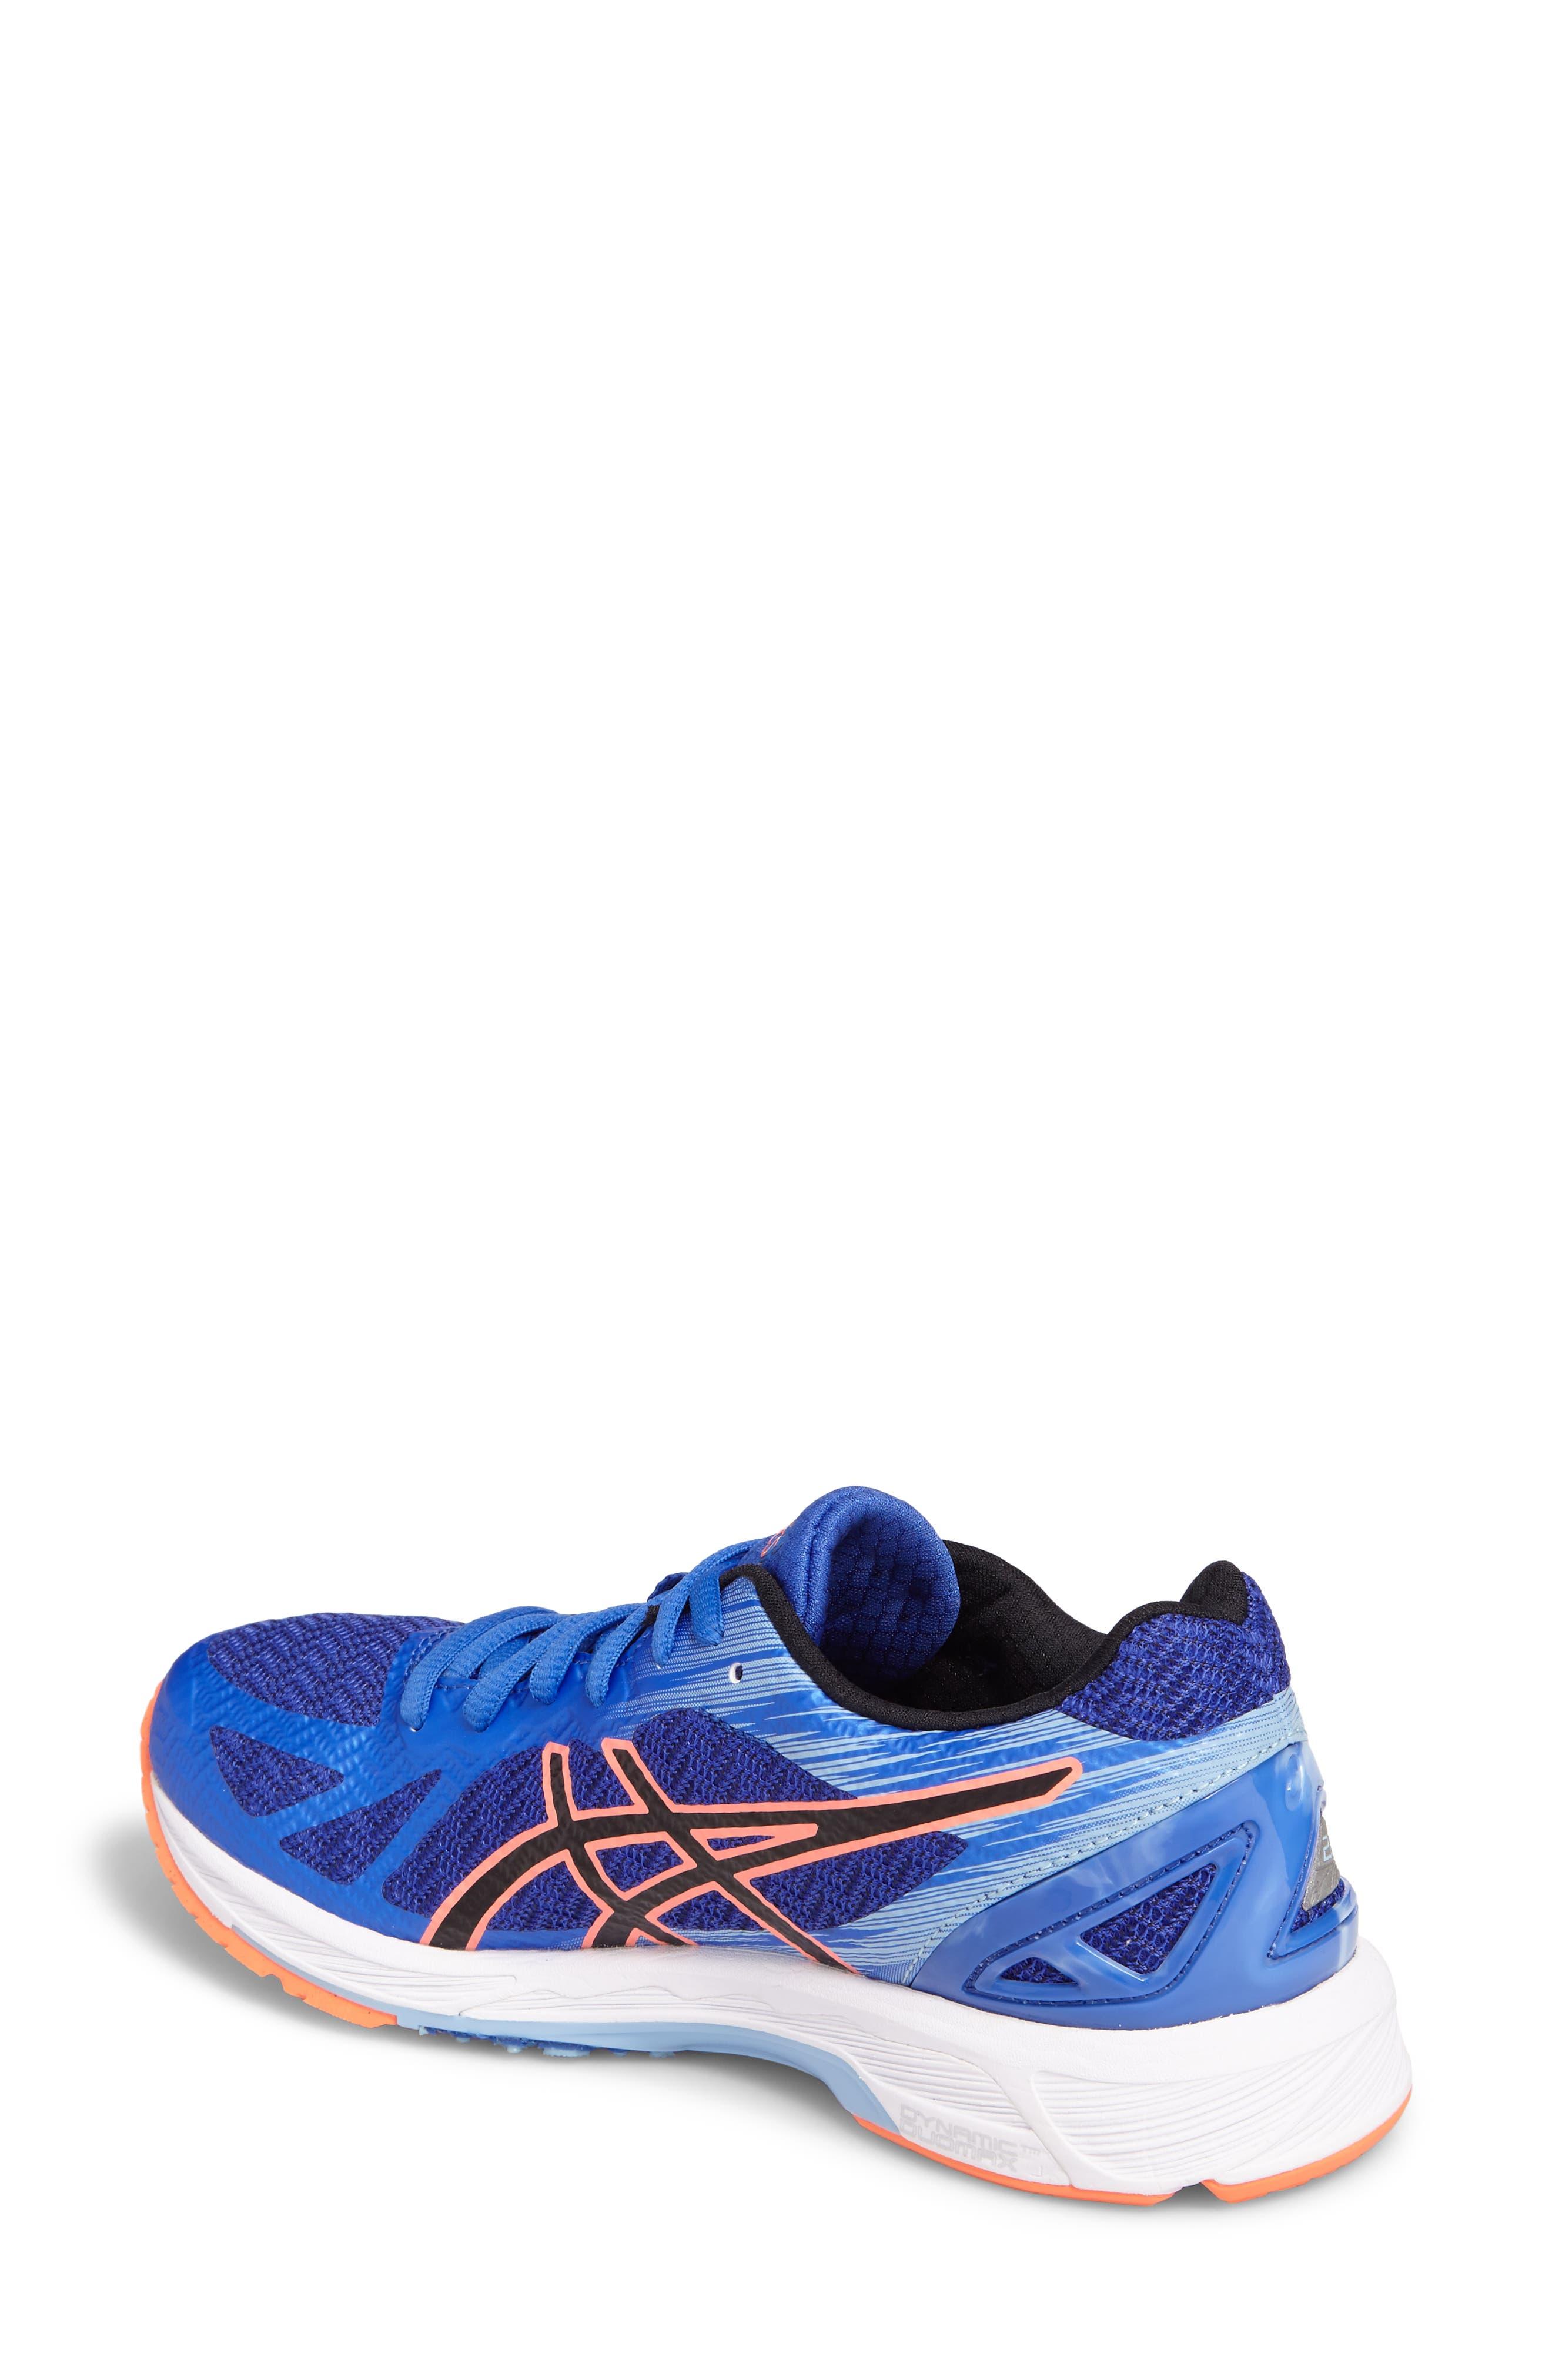 GEL-DS Trainer 22 Running Shoe,                             Alternate thumbnail 2, color,                             480